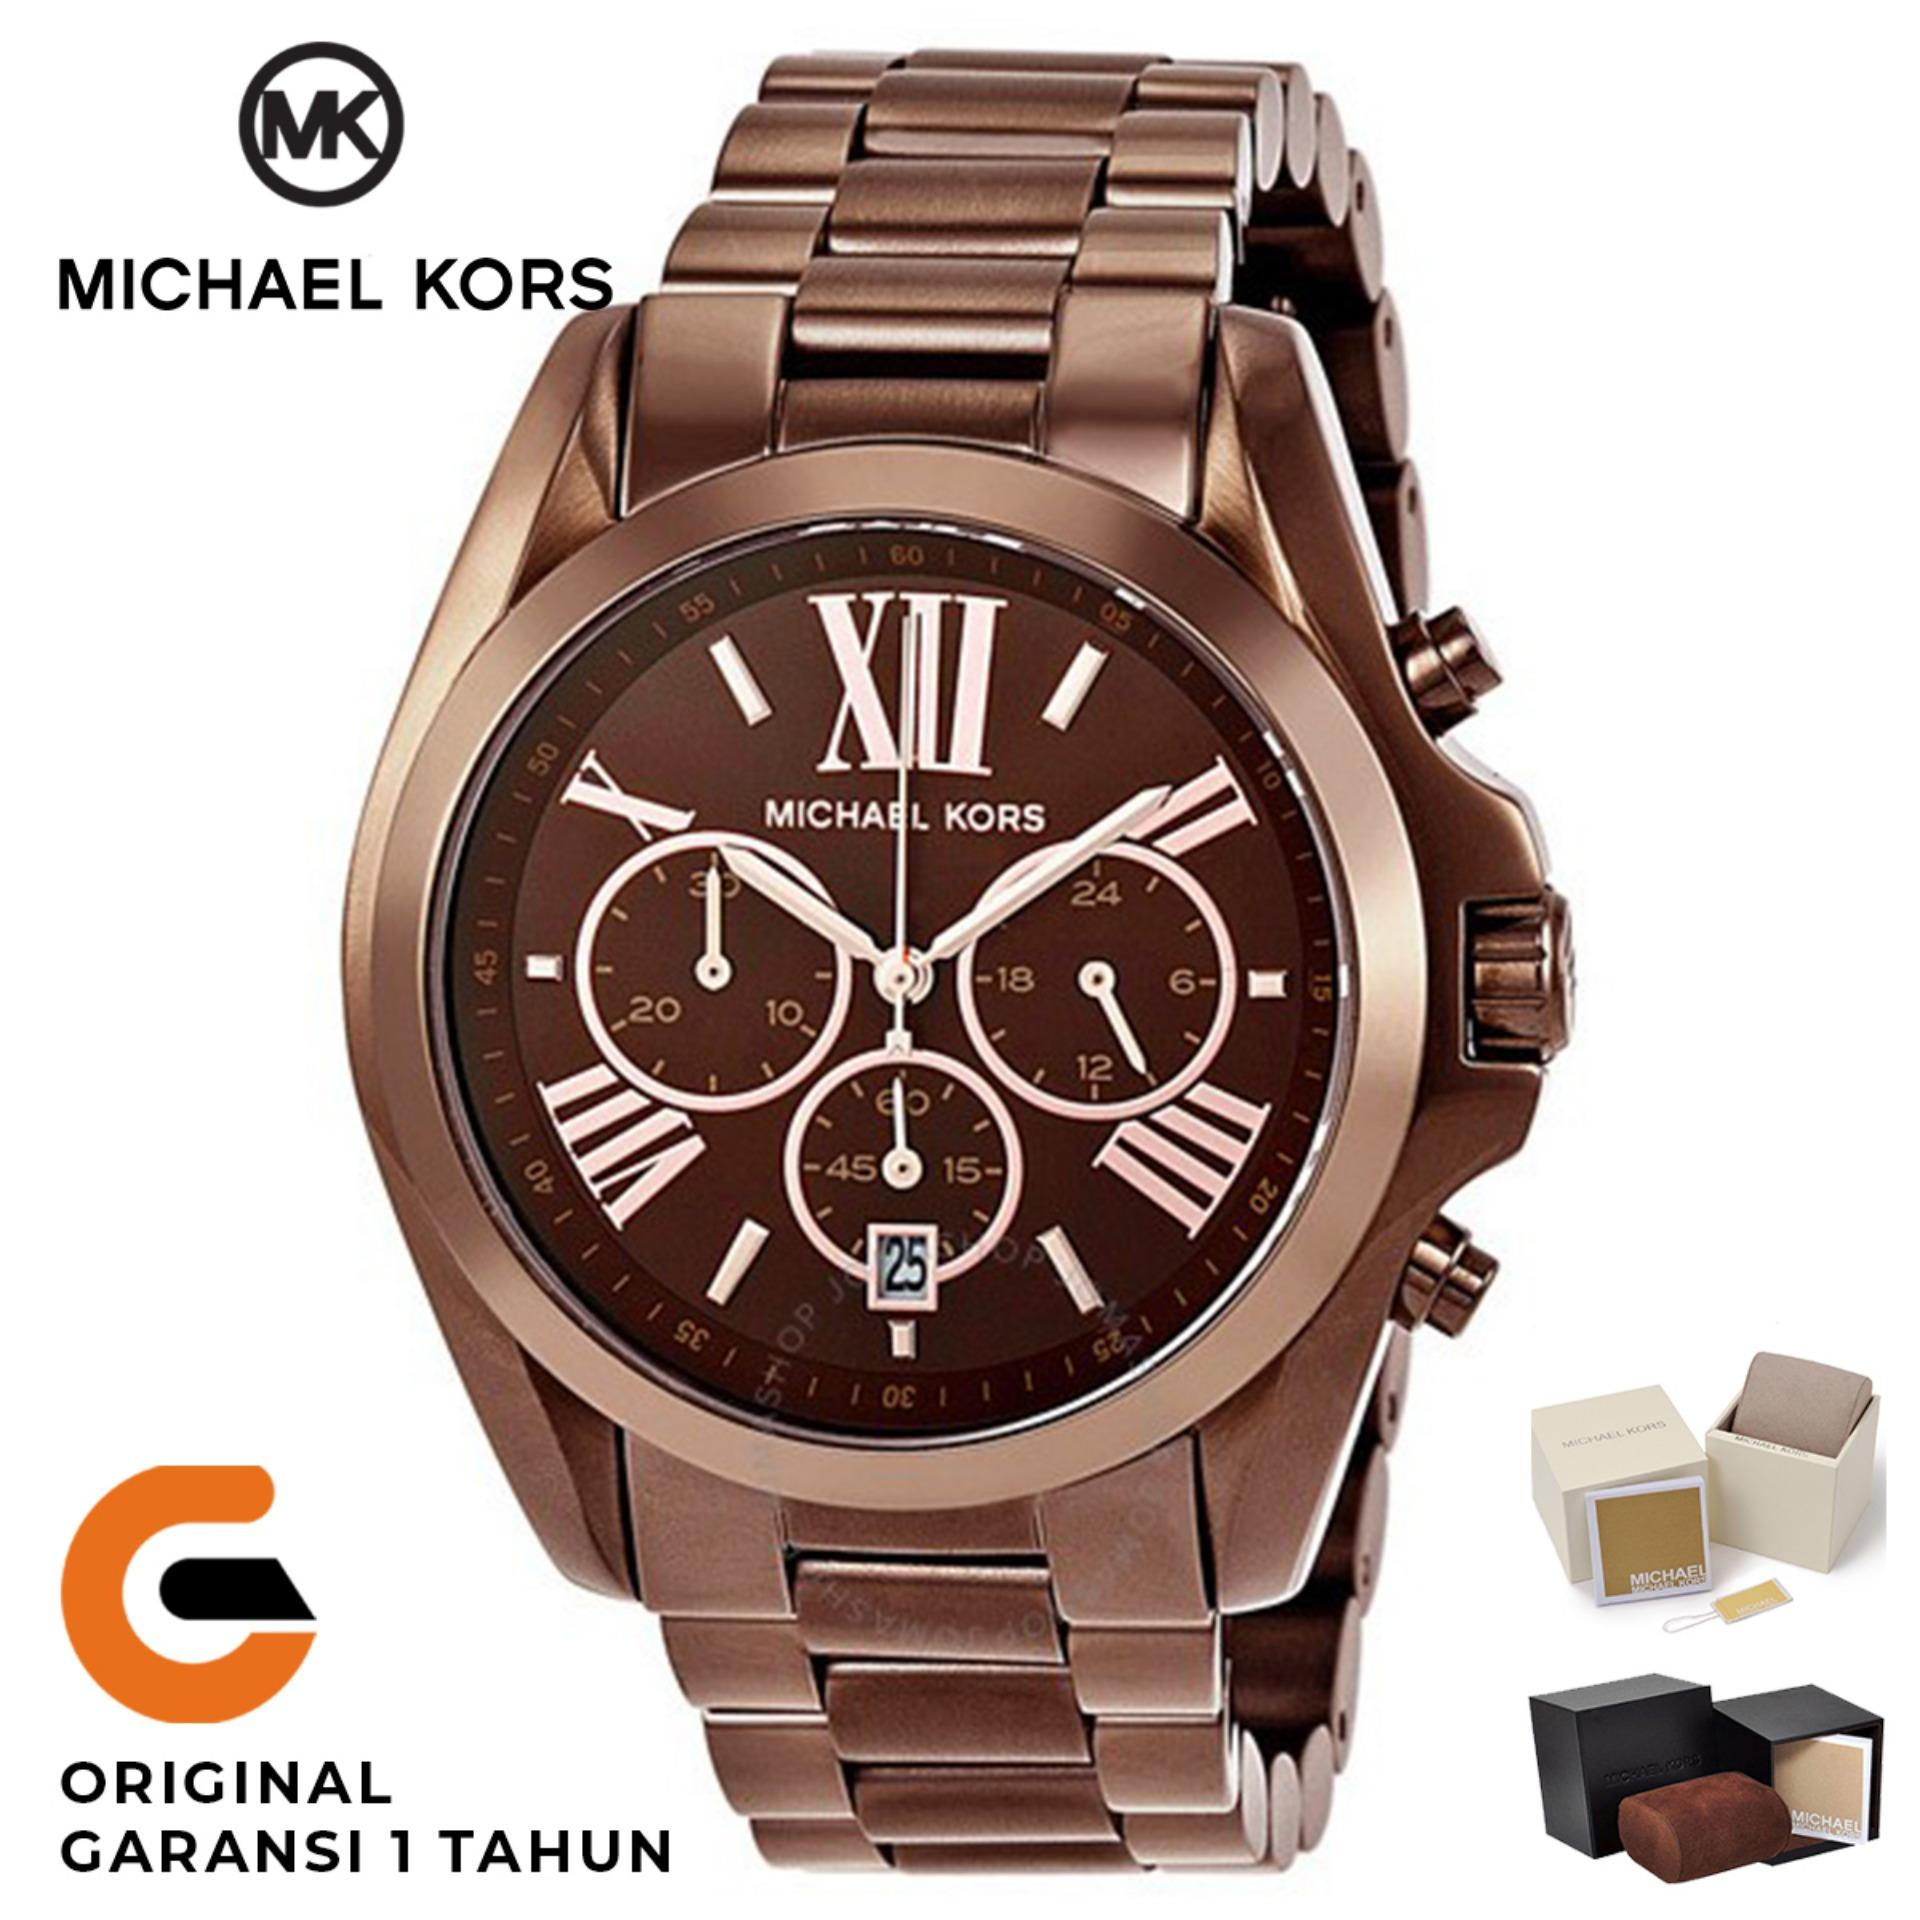 a712ccf184cf Michael Kors Watch Original Jam Tangan Wanita Michael Kors Bradshaw MK5628  Tali Rantai Stainless Strap Dial